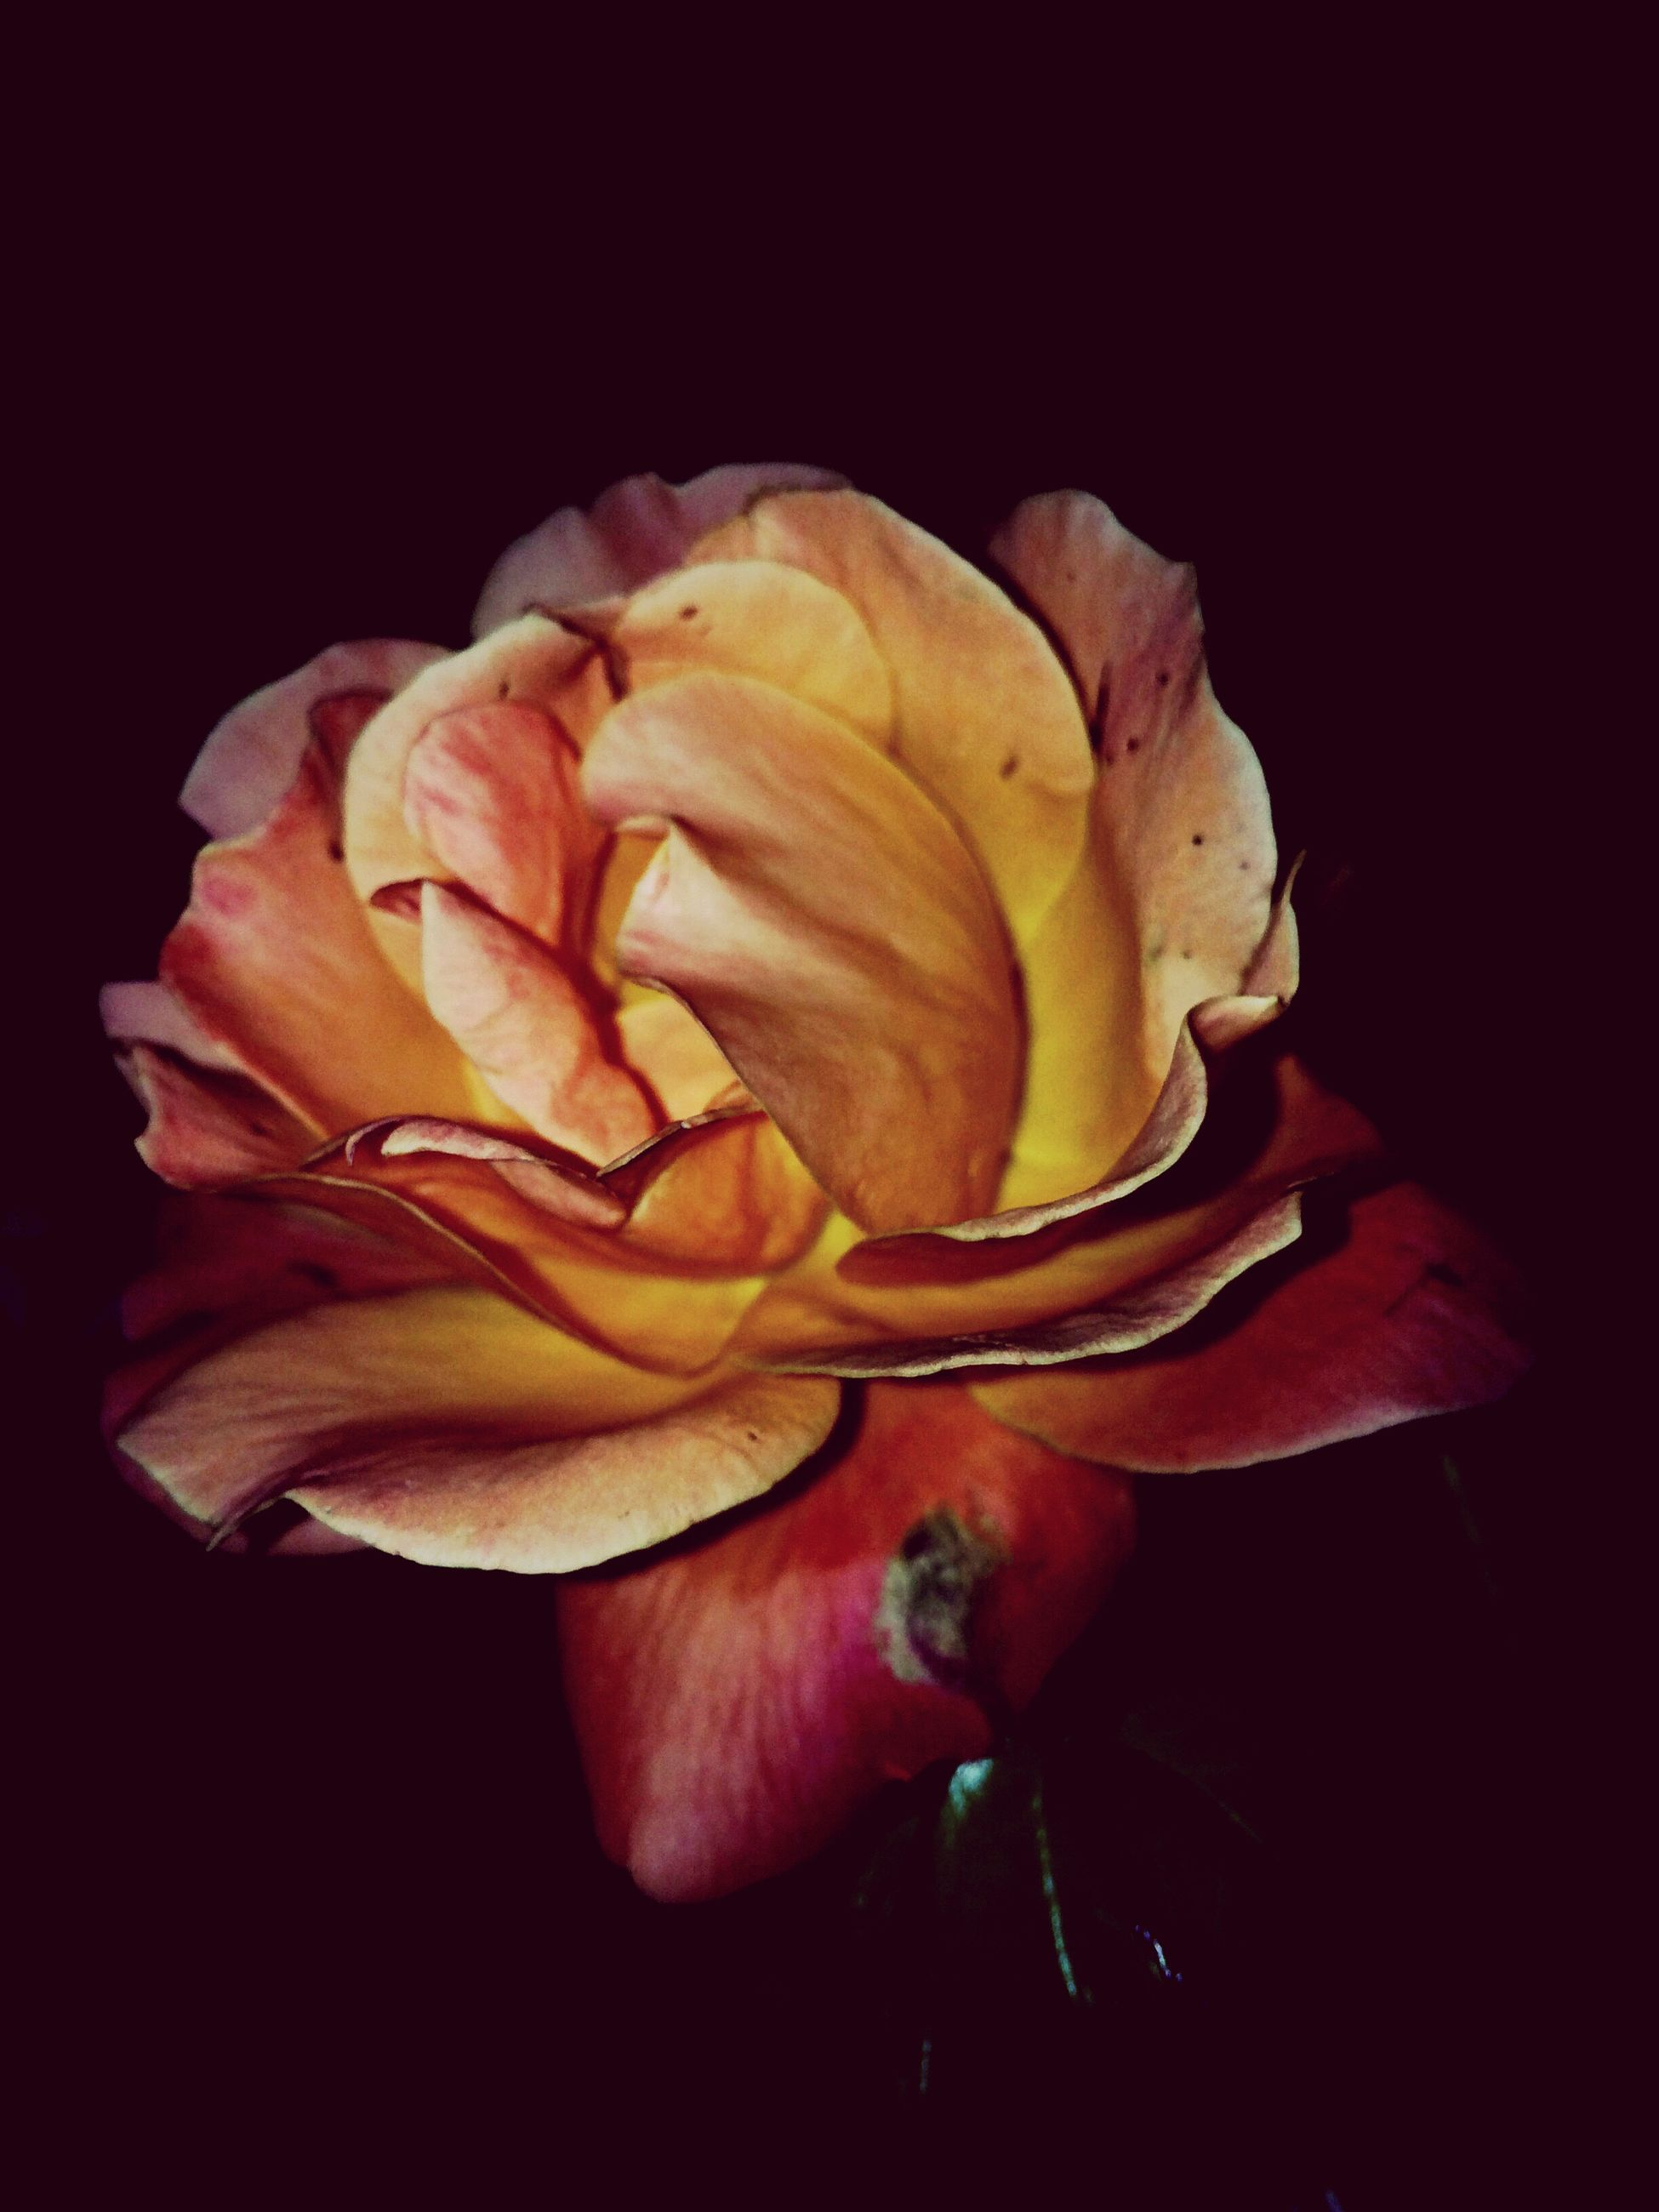 flower, freshness, petal, fragility, flower head, close-up, black background, rose - flower, beauty in nature, single flower, studio shot, nature, yellow, springtime, blossom, rose, botany, softness, in bloom, vibrant color